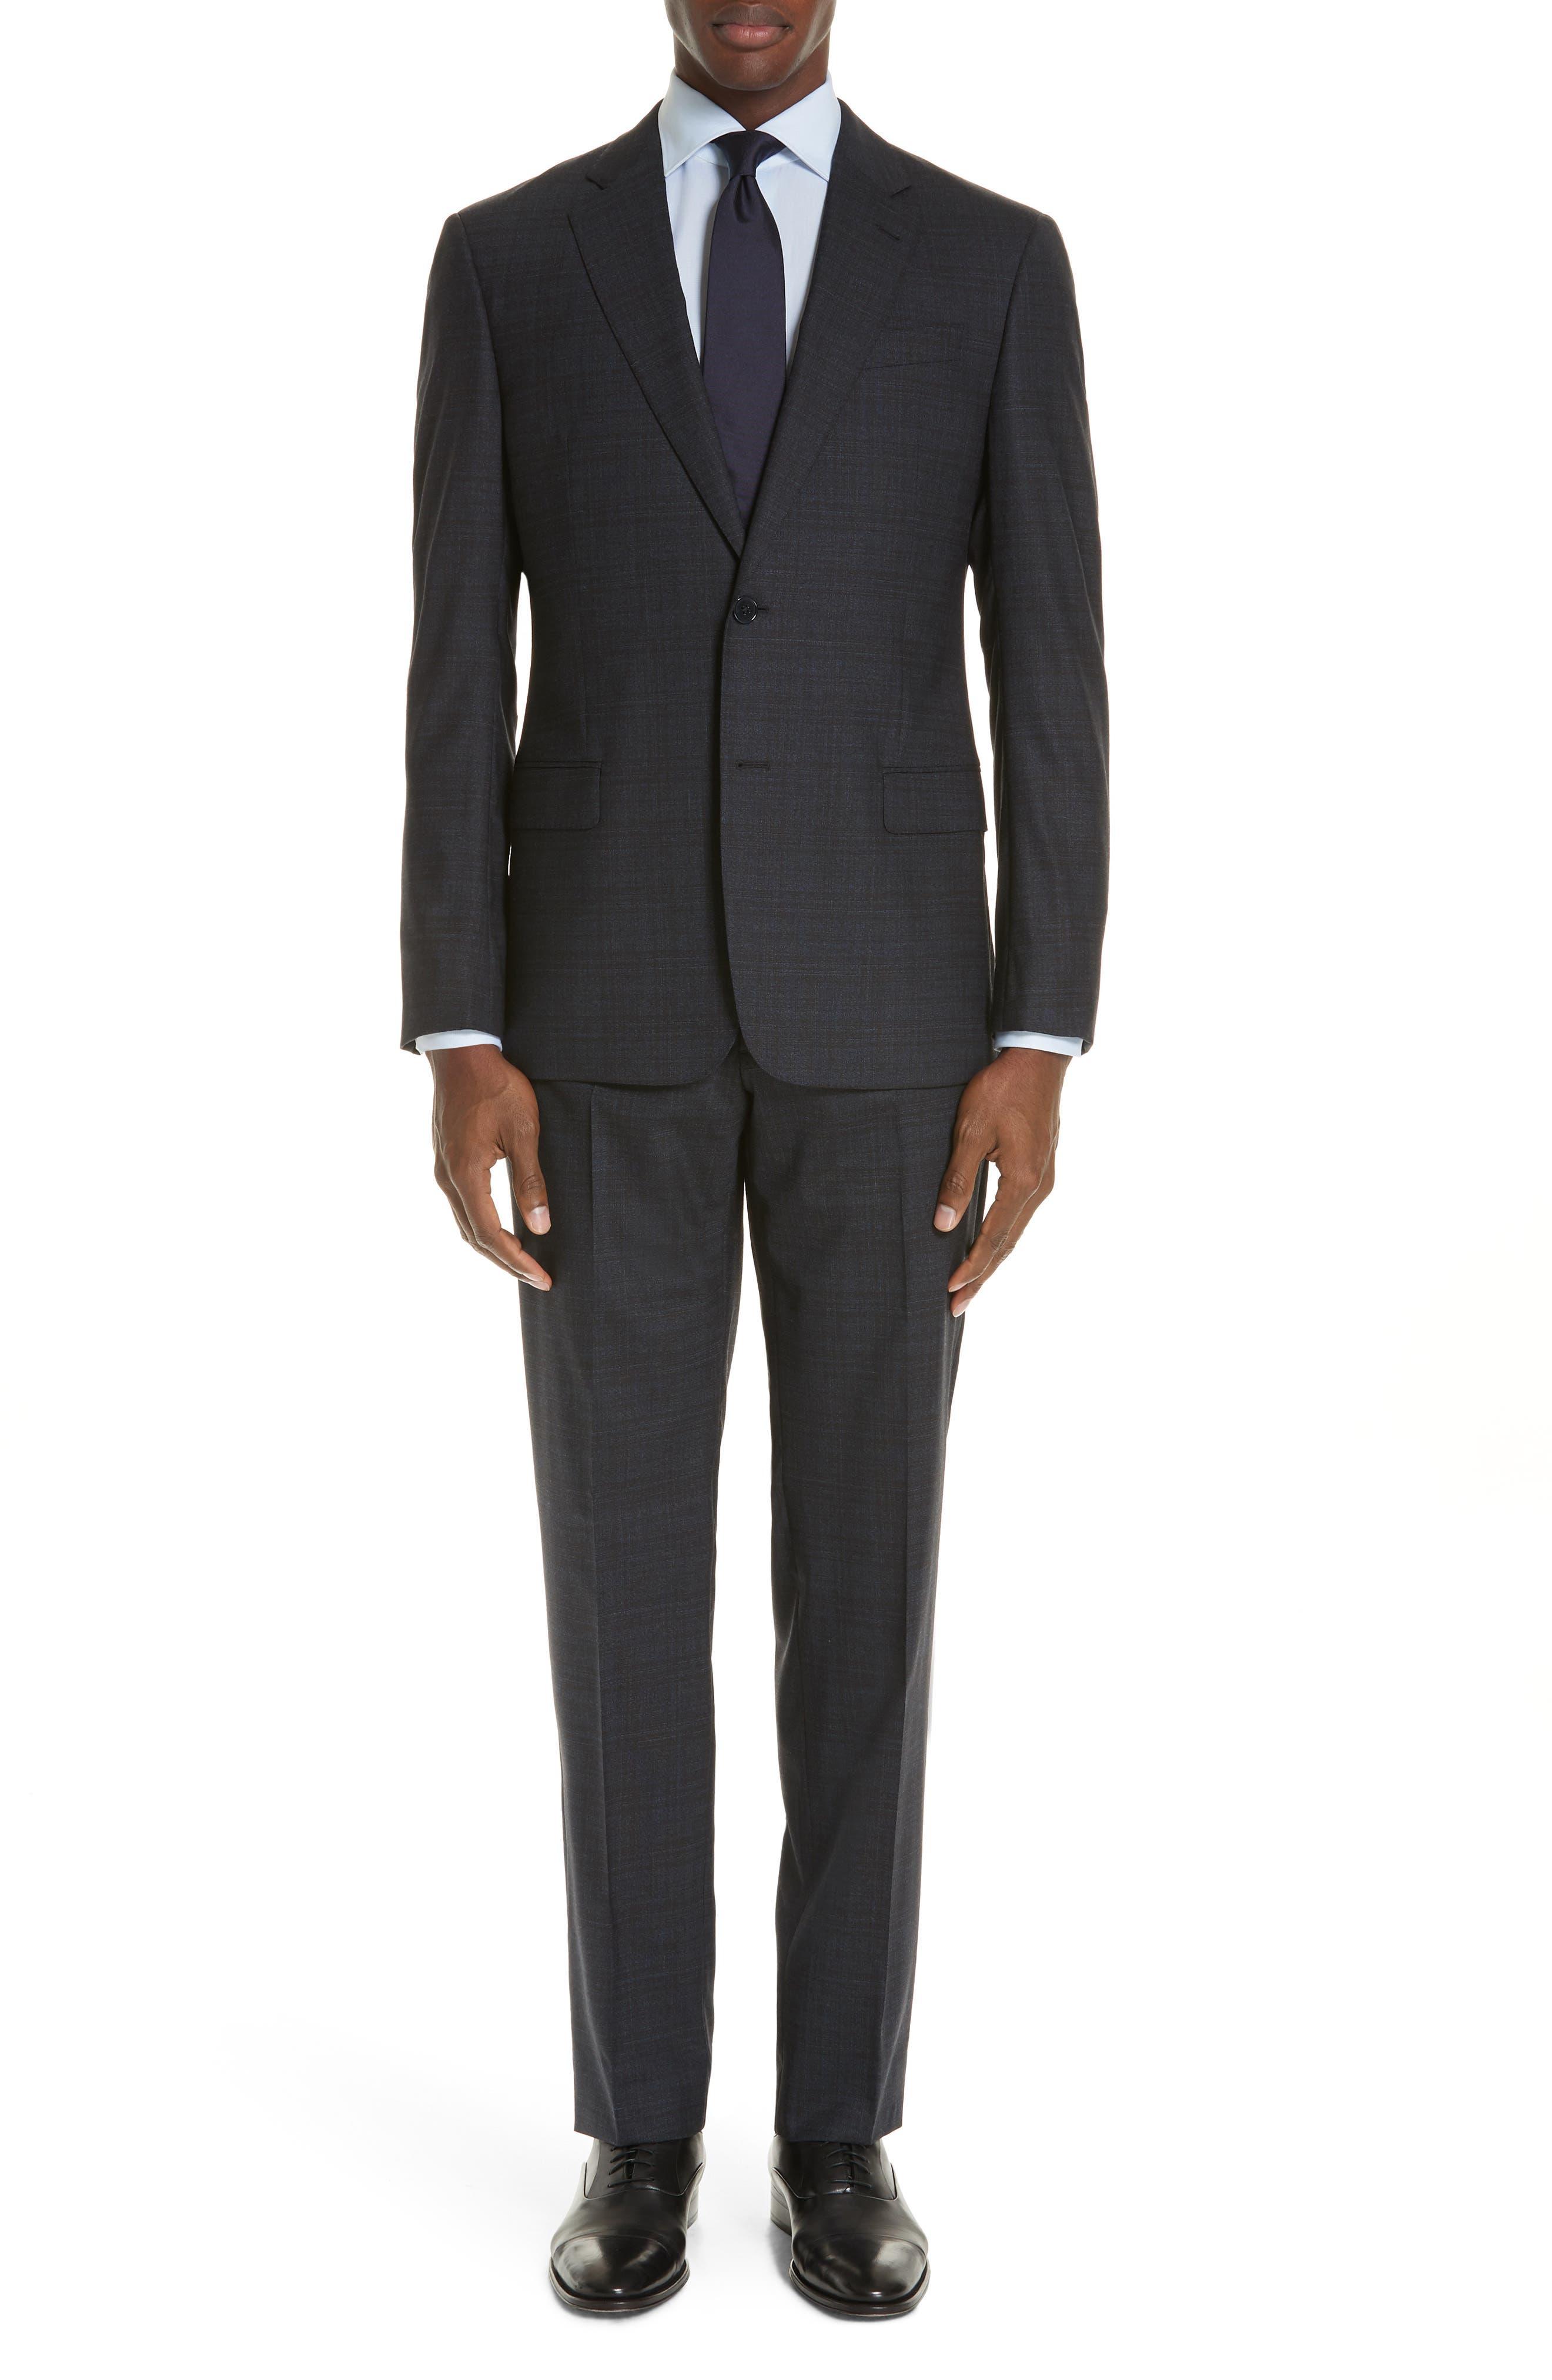 G-Line Trim Fit Stretch Plaid Wool Suit,                             Main thumbnail 1, color,                             NAVY/ BROWN